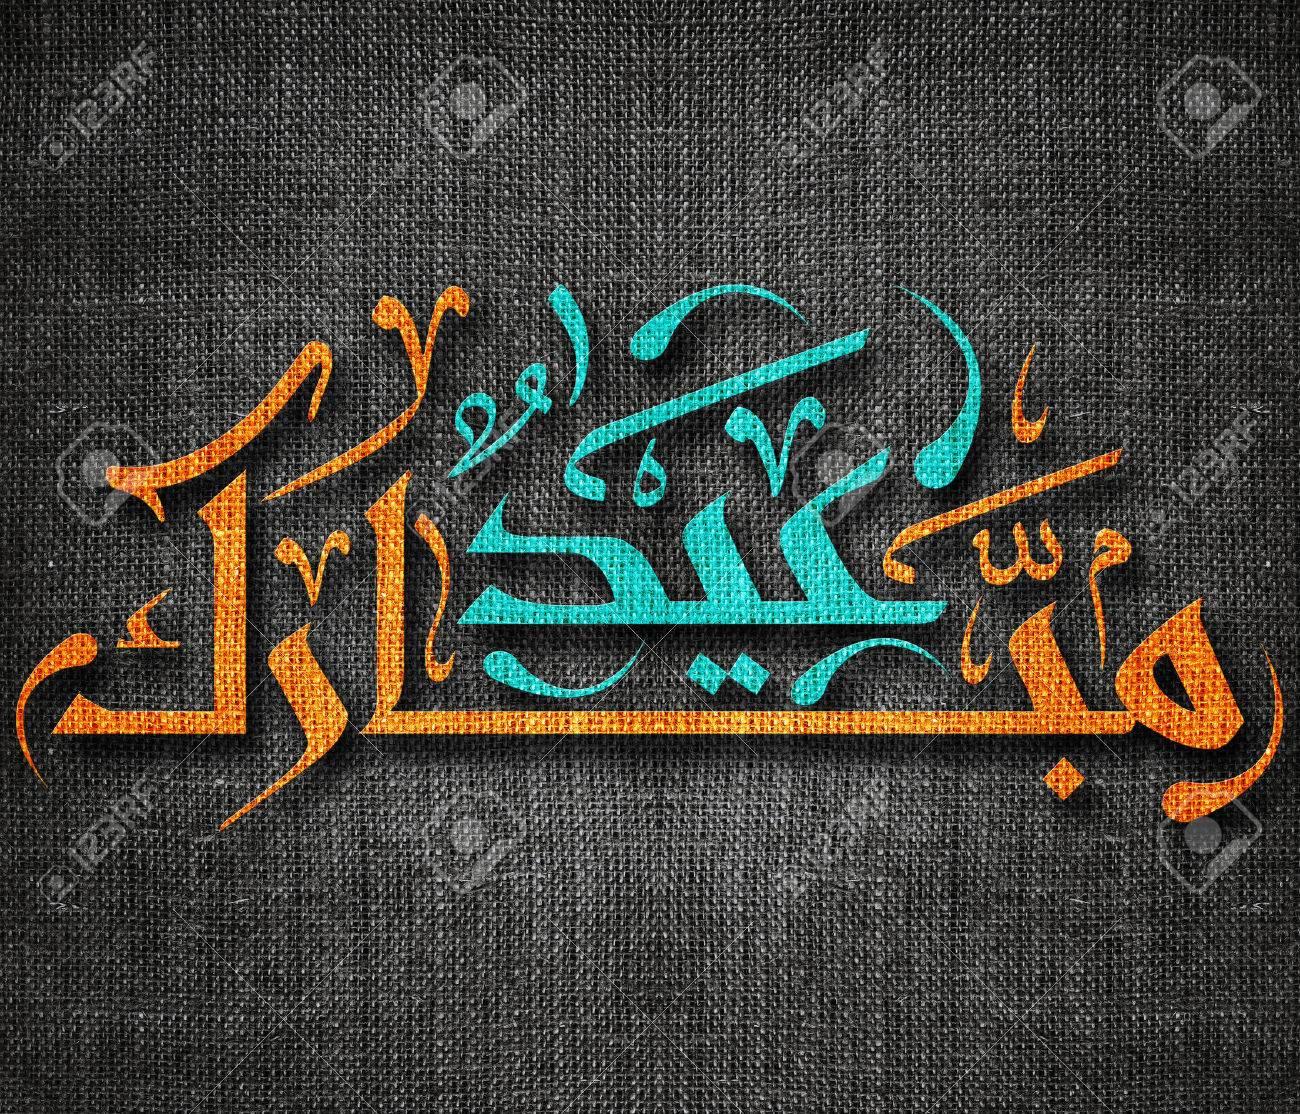 Popular Id Festival Eid Al-Fitr Greeting - 39373242-the-holy-month-of-muslim-community-festival-ramadan-kareem-and-eid-al-fitr-greeting-card-with-arabic  Perfect Image Reference_563246 .jpg